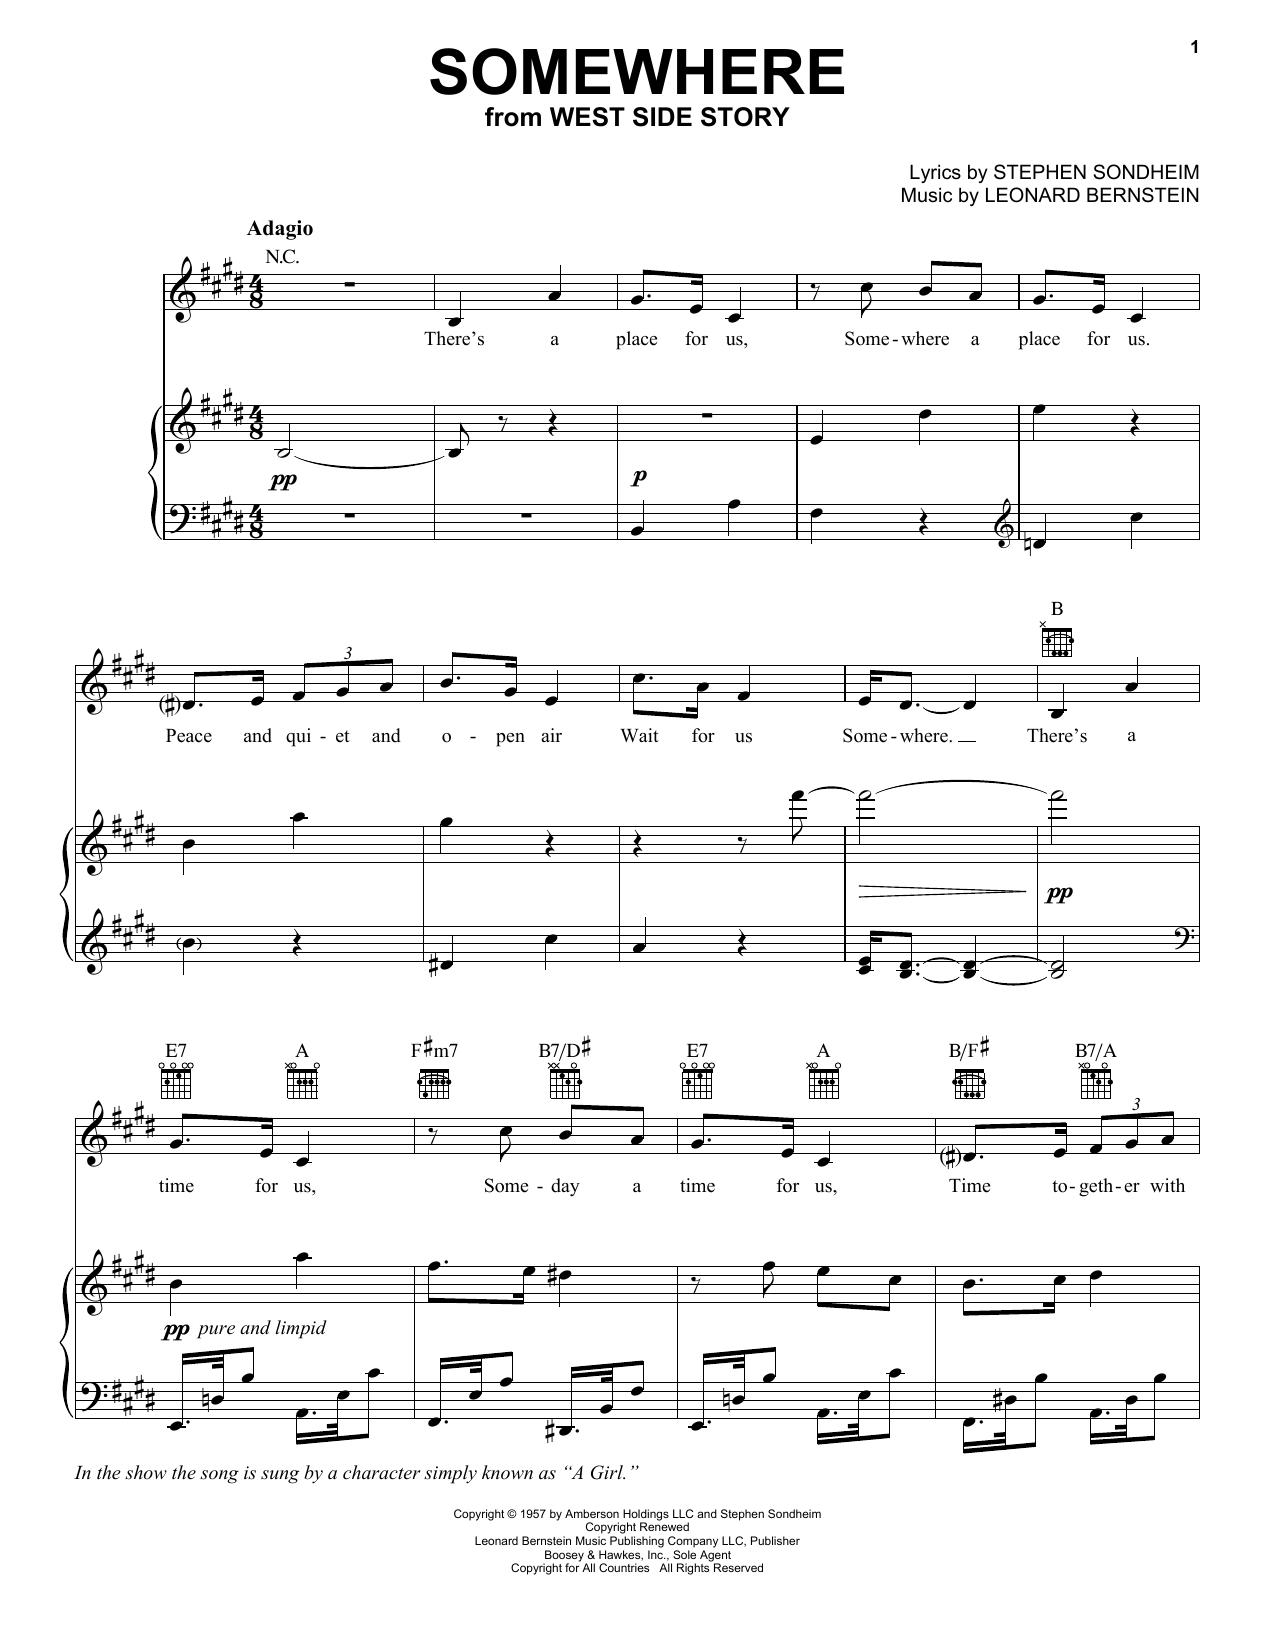 Stephen Sondheim Somewhere sheet music notes and chords